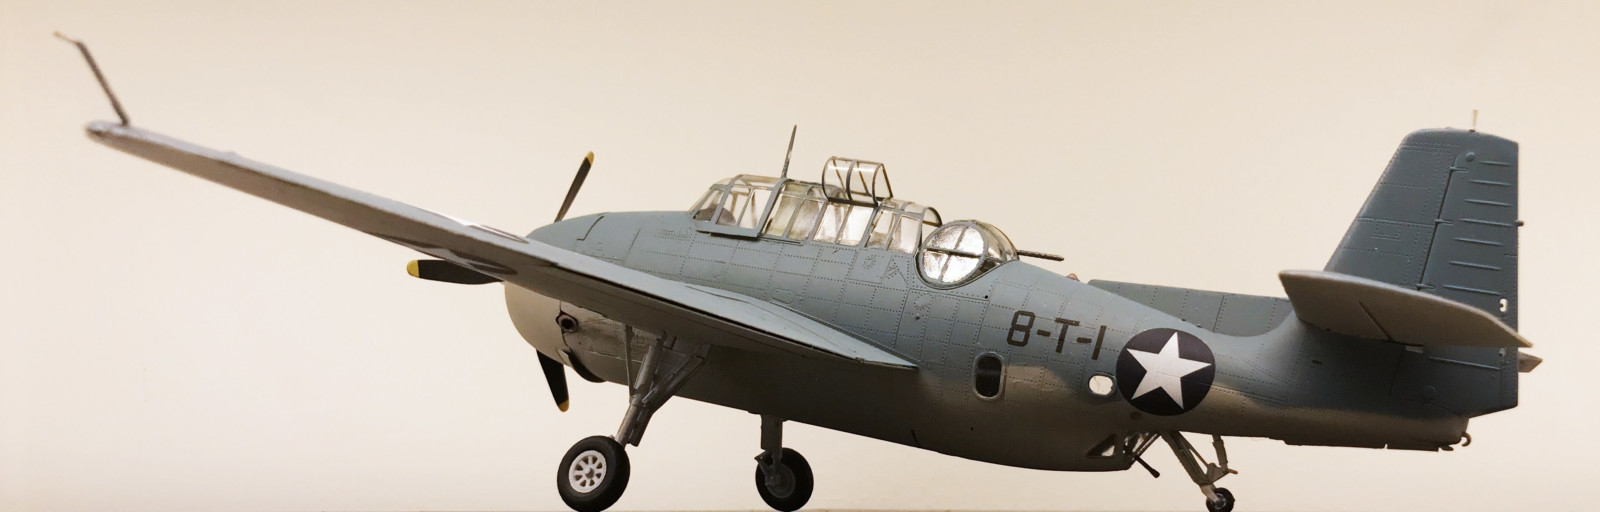 Neu Hobbyboss 80314-1:48 Grumman TBF-1C Avenger